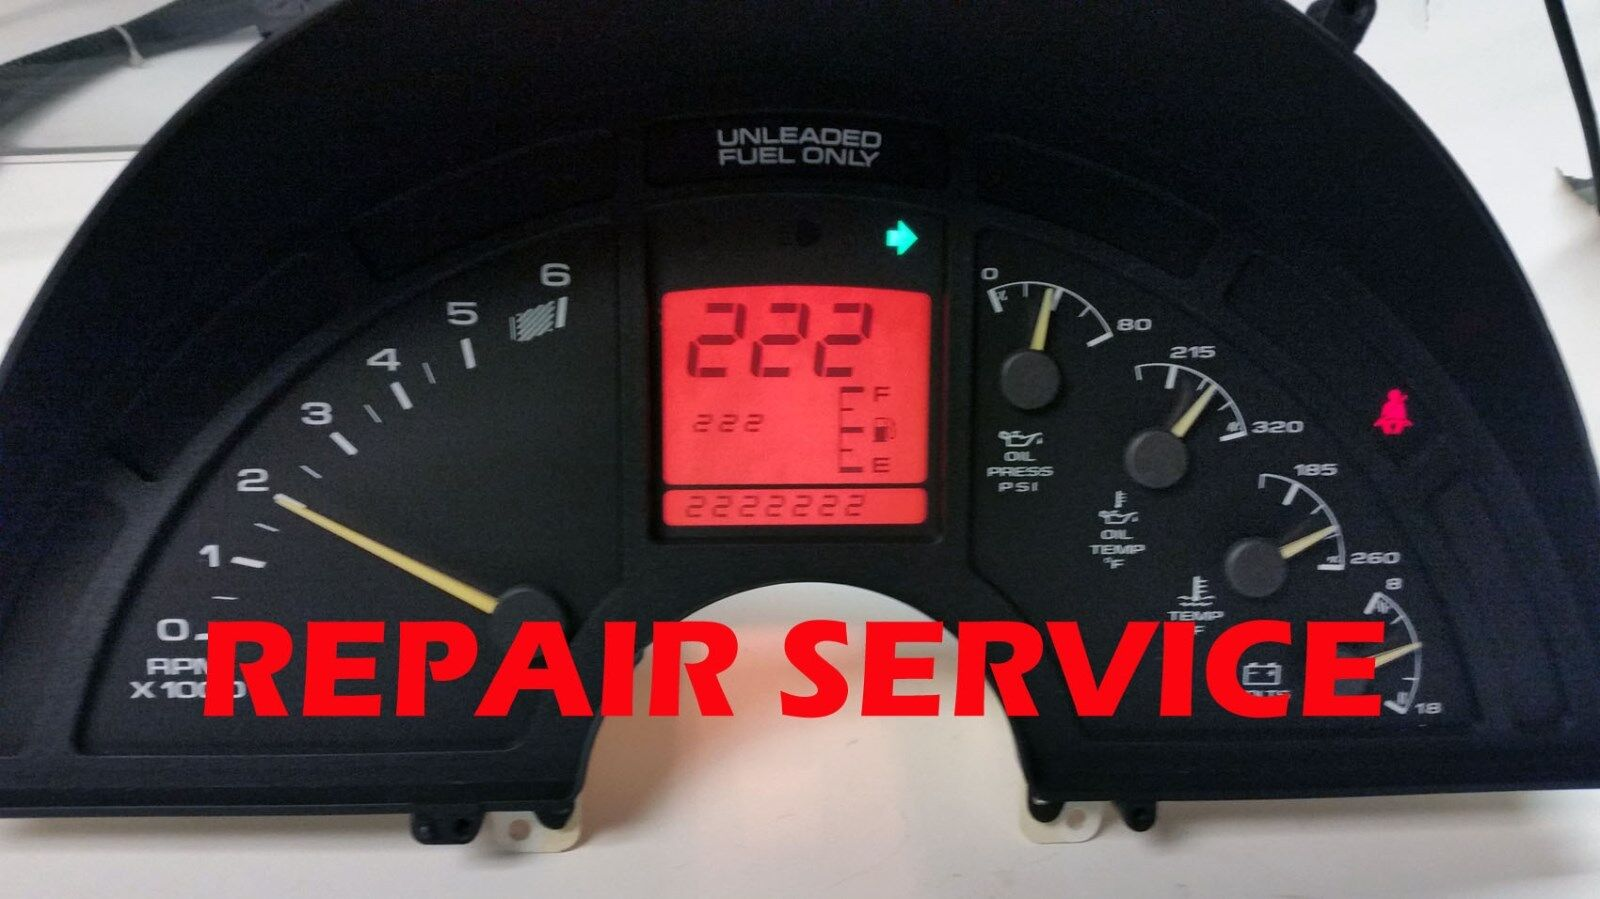 1990 1991 19921993 1994 1995 1996 CHEVY CORVET Instrument Cluster REPAIR SERVICE